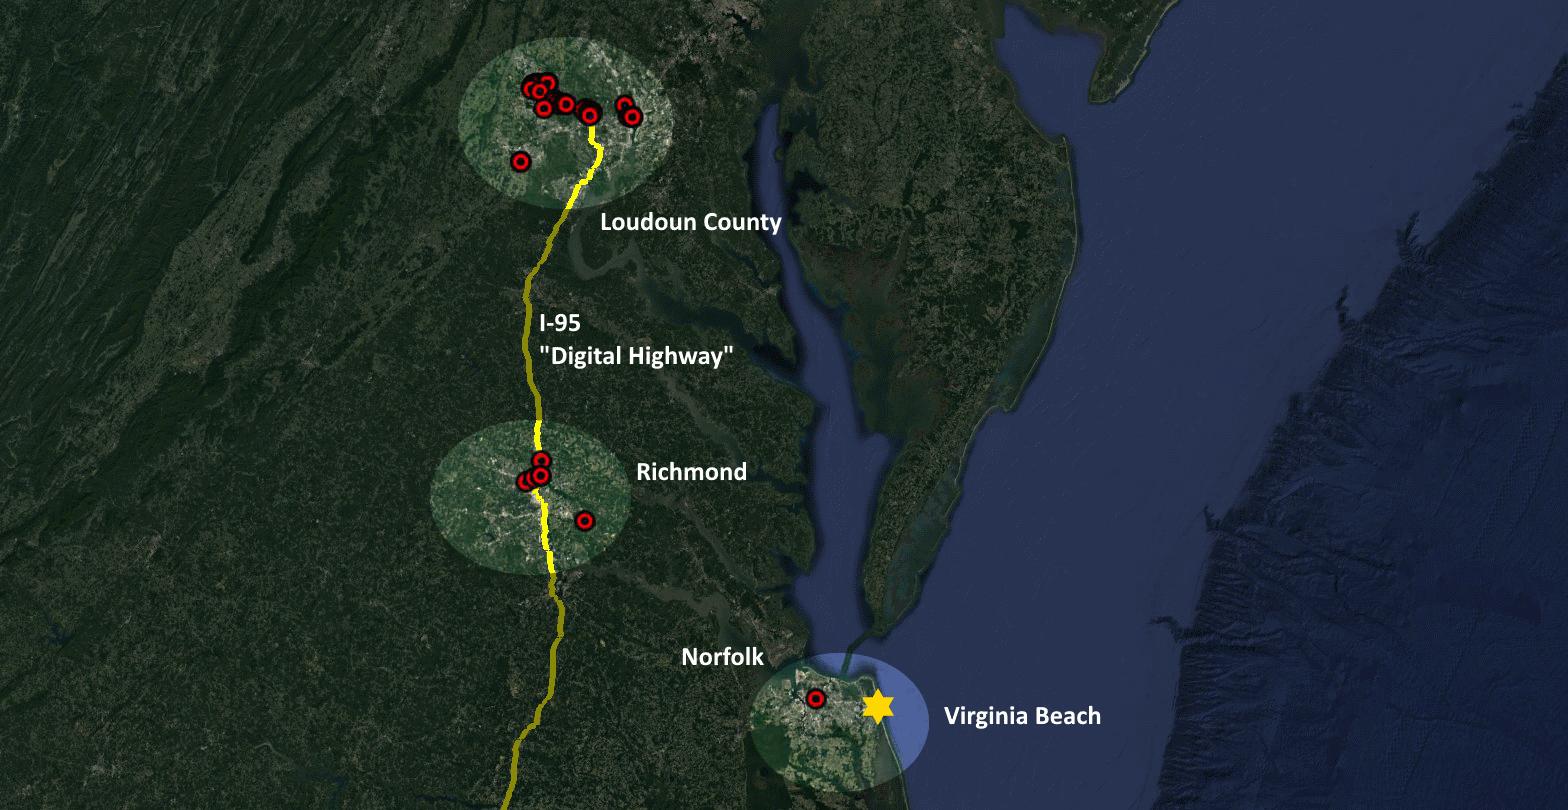 Virginia Beach Digital Highway I-95